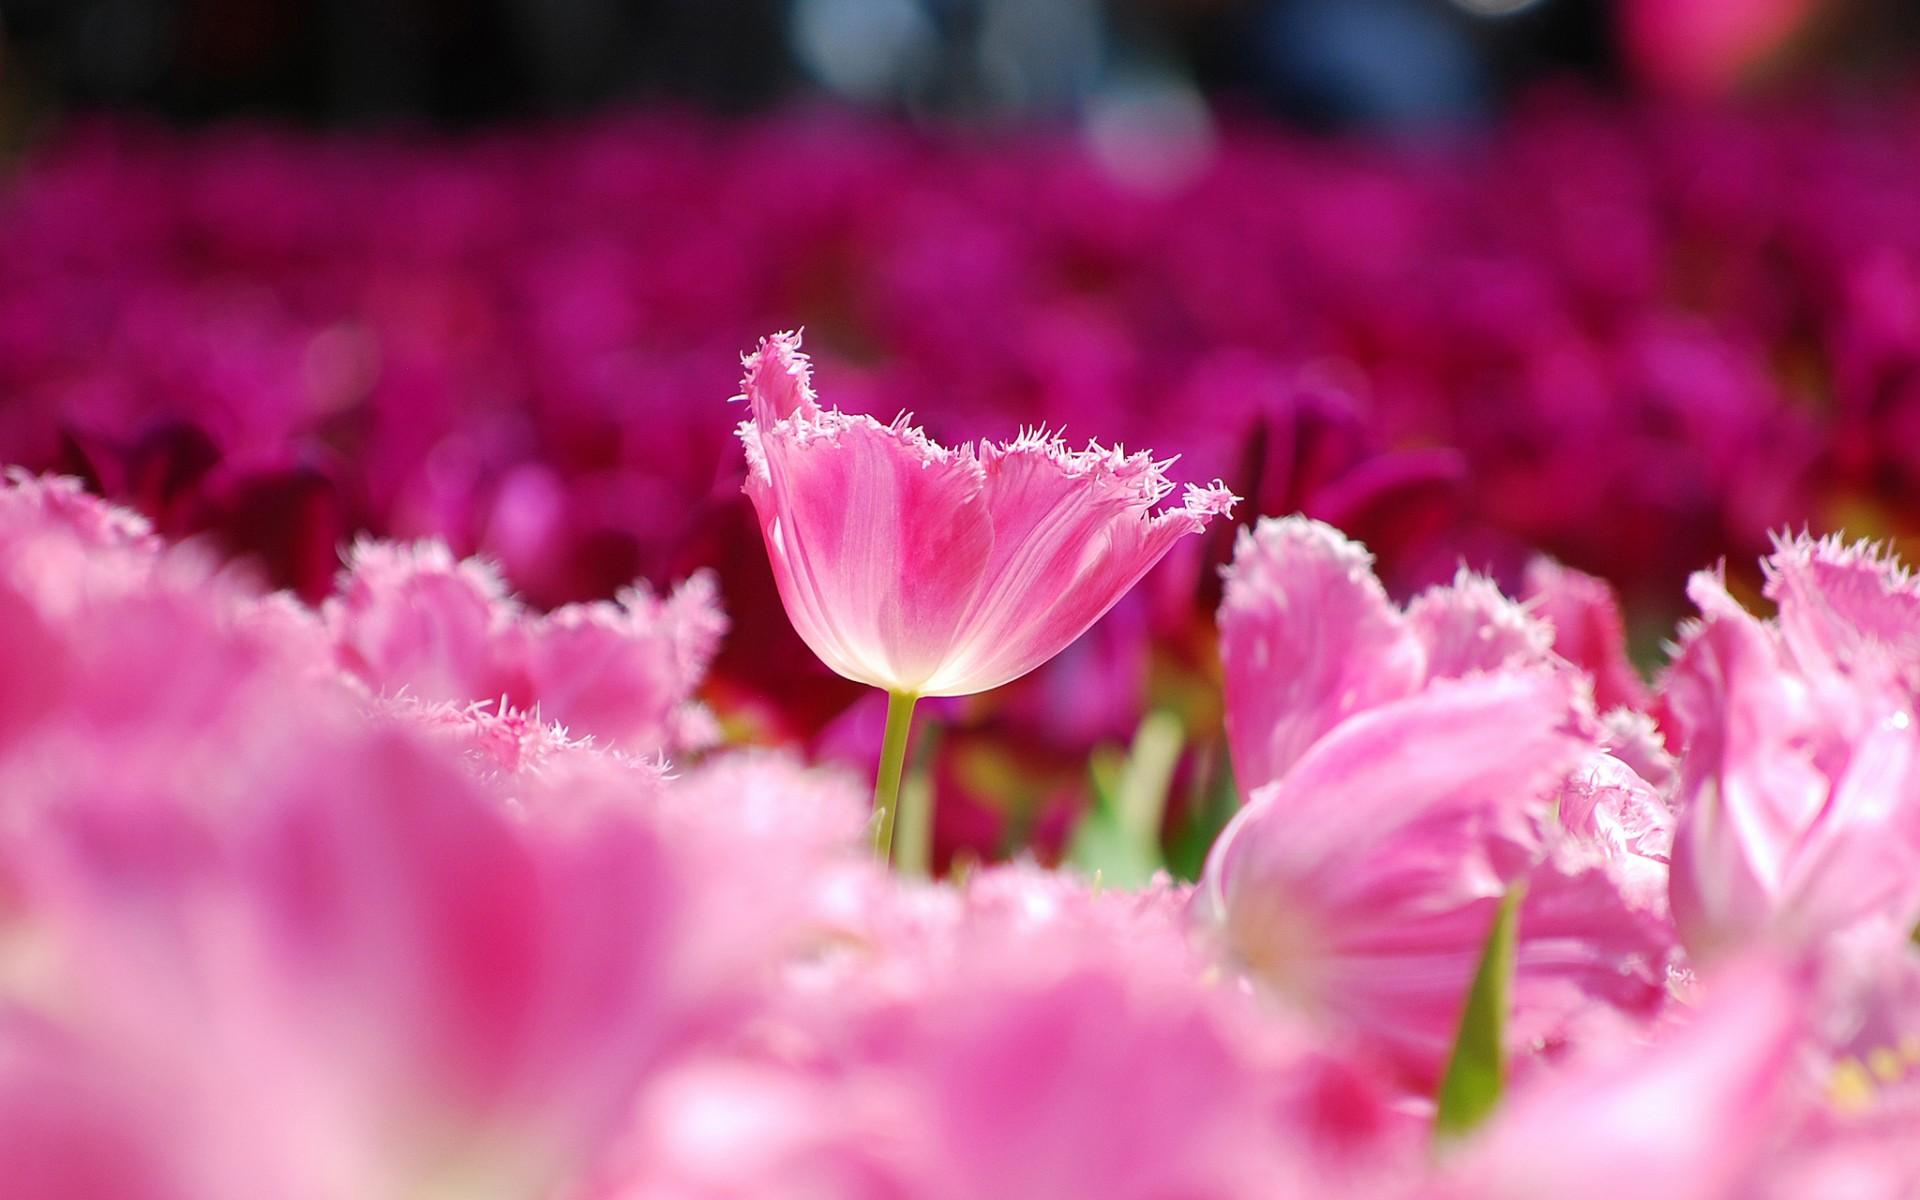 3d Hd Wallpapers Flowers Rose Pink Flower Wallpapers Hd